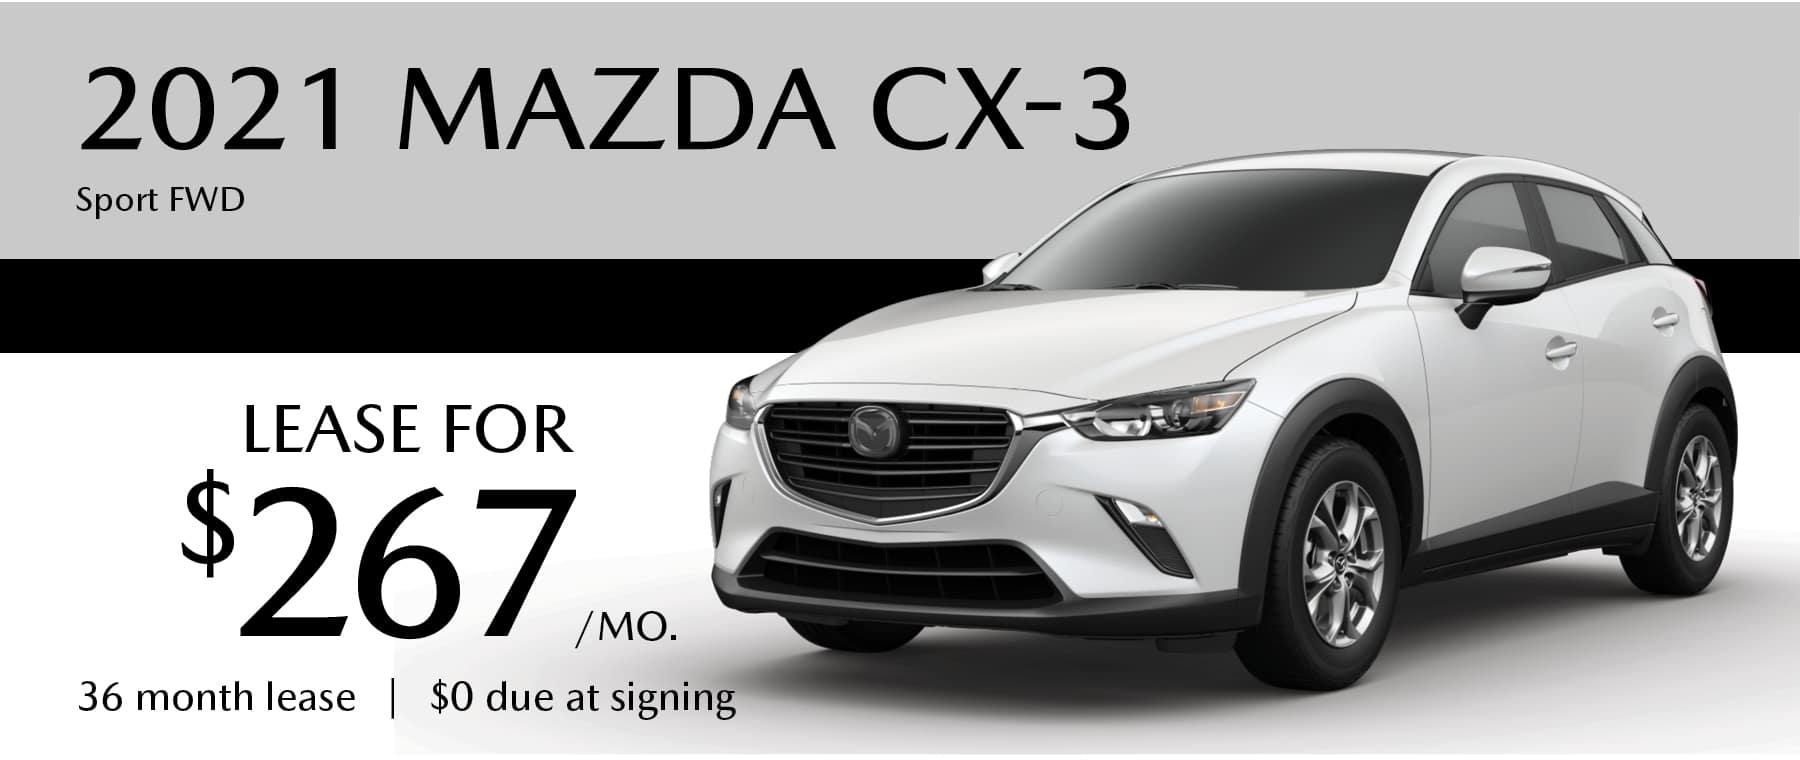 2021 MAZDA_CX3 Sport FWD